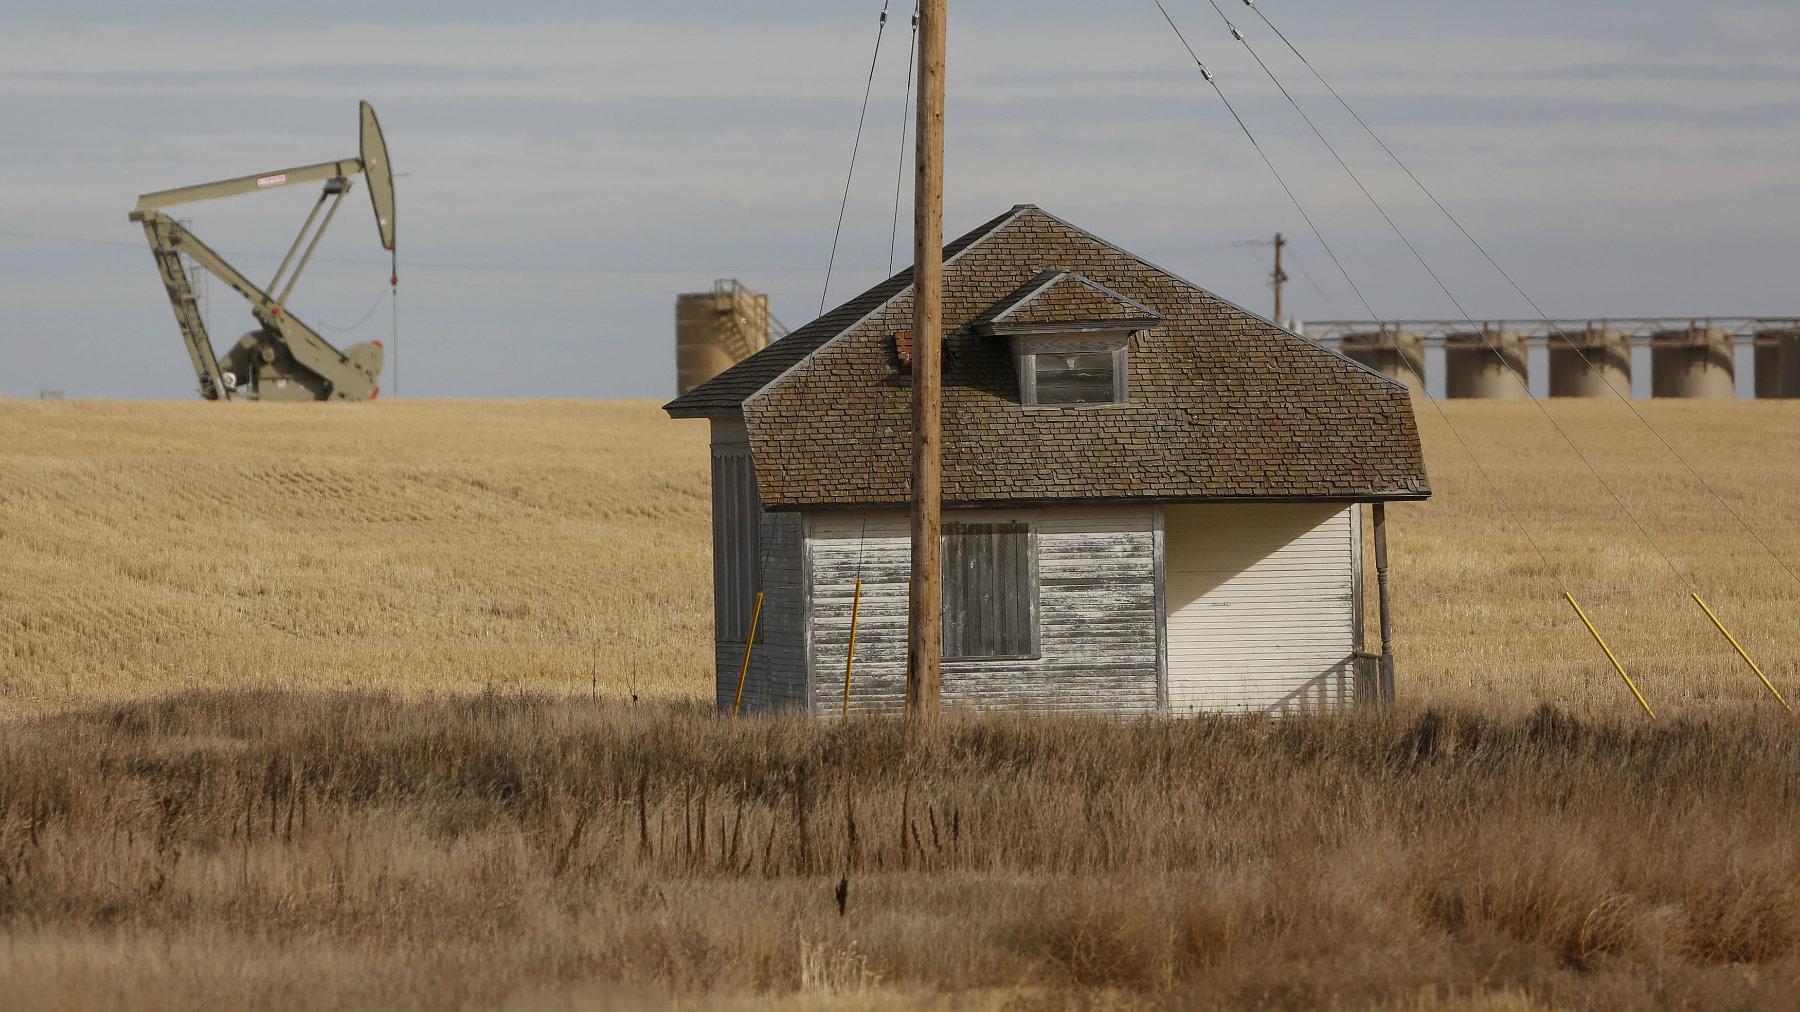 An oil pump jack operates near a vacant farm structure outside Williston, North Dakota.